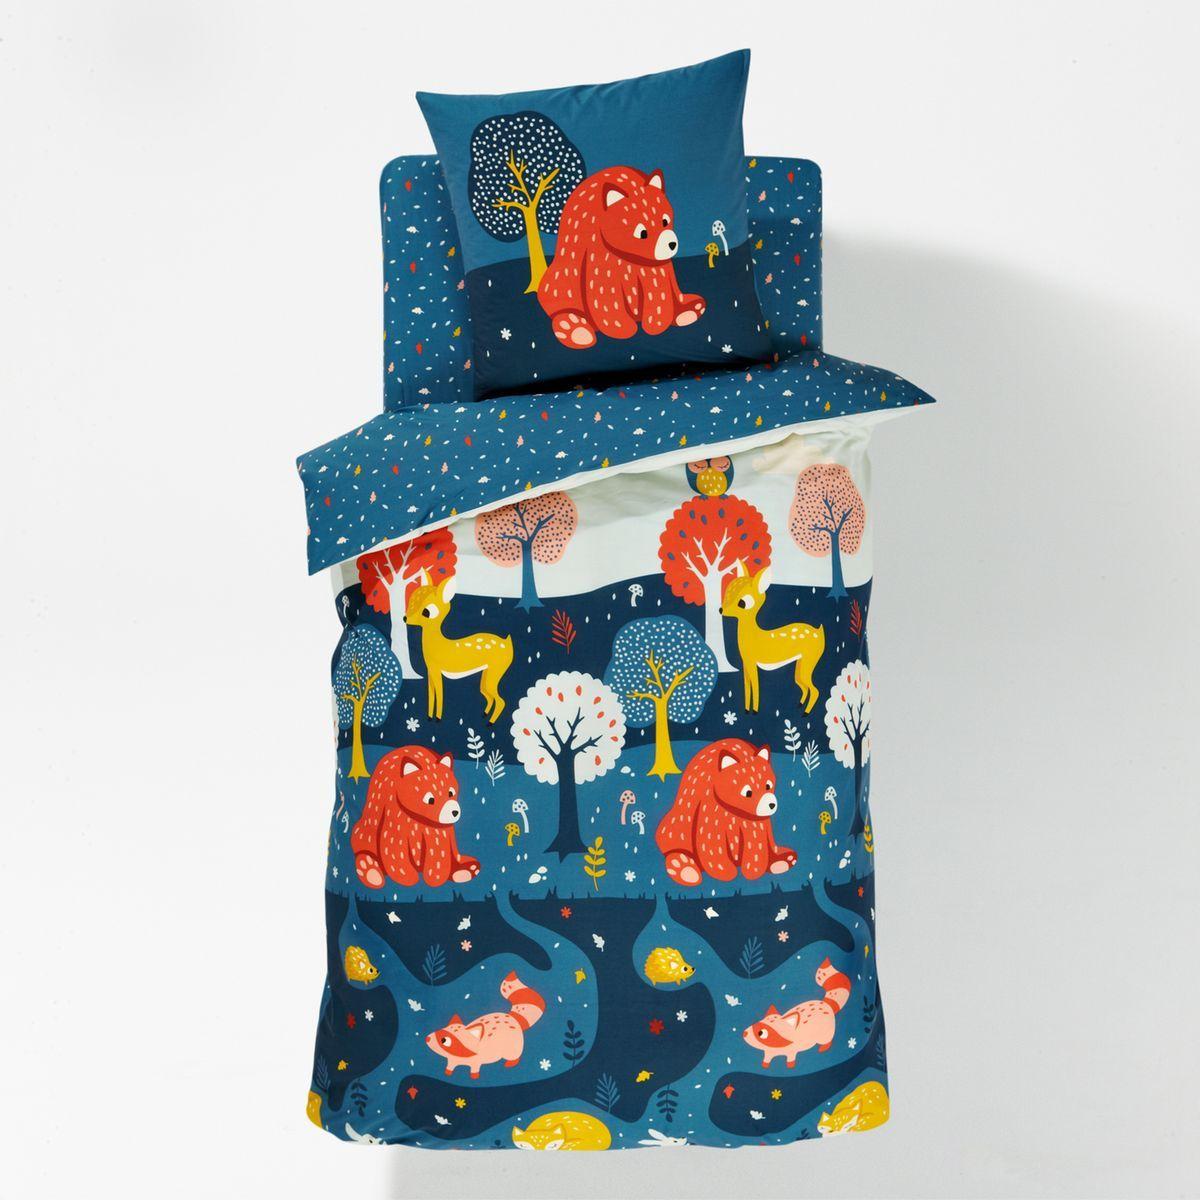 housse de couette enfant orsi for t fantastique housse. Black Bedroom Furniture Sets. Home Design Ideas